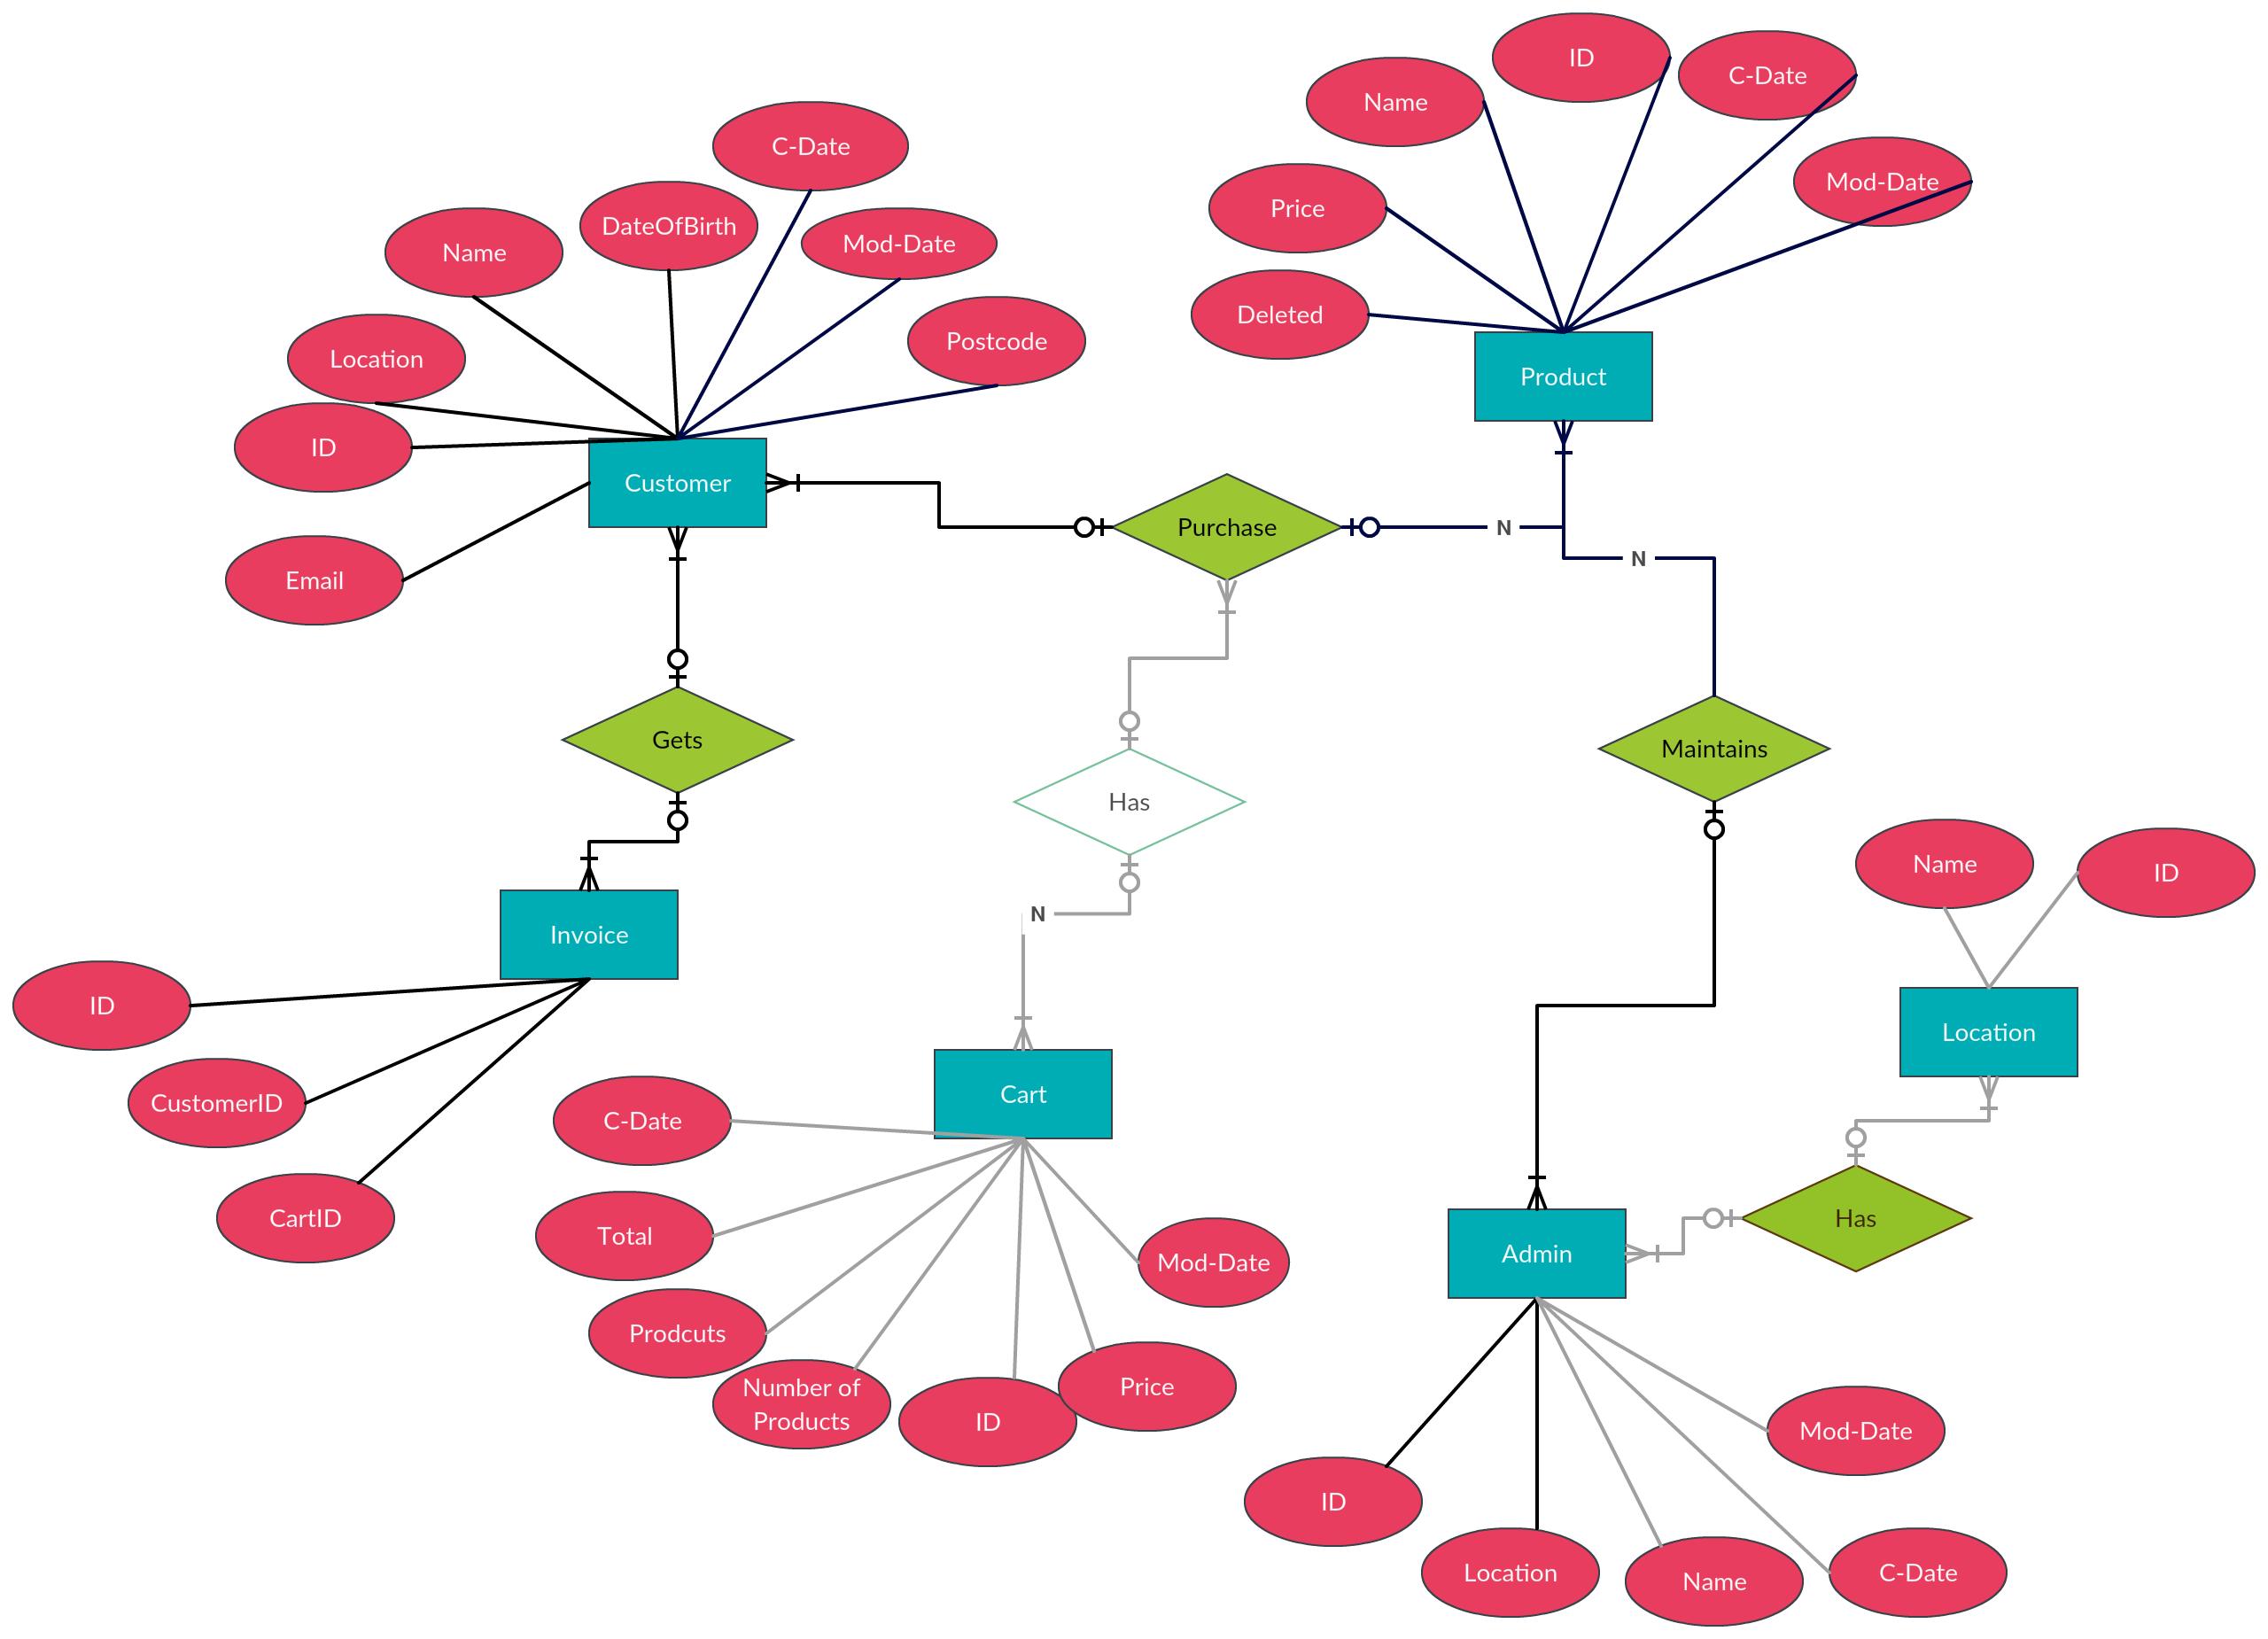 Entity Relationship Diagram (Er Diagram) Of Mobile Shopping